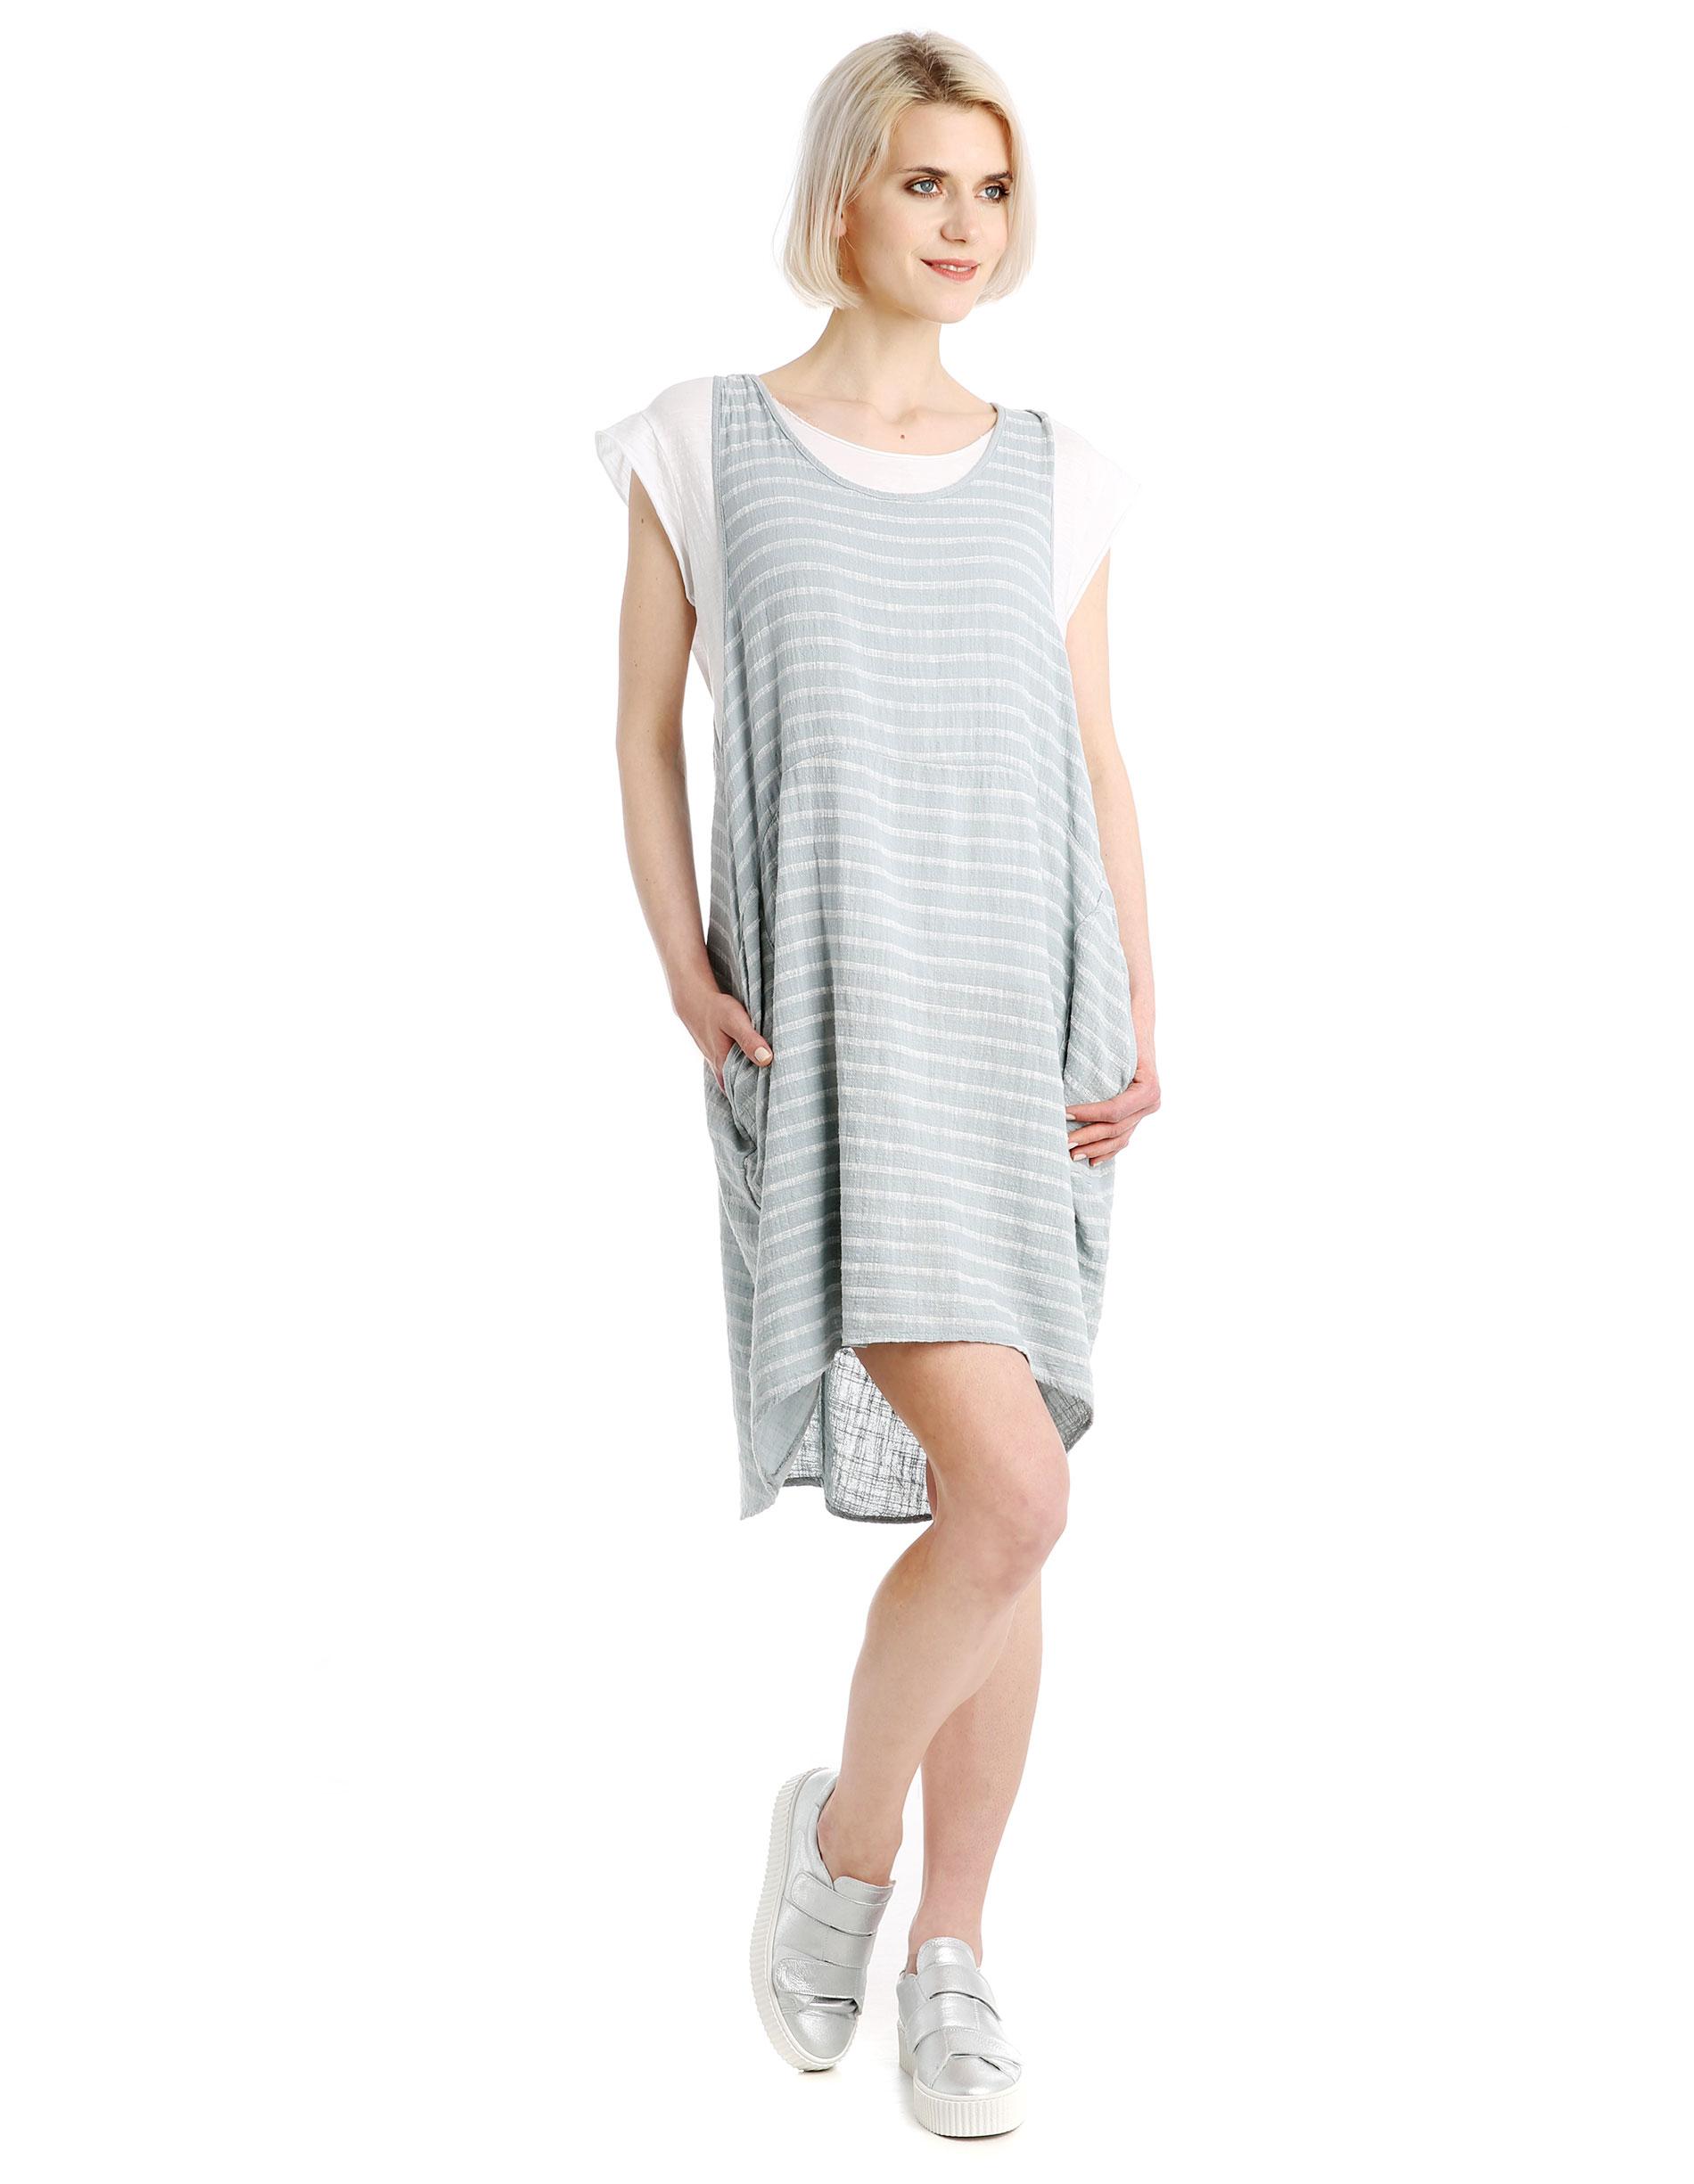 Sukienka - 52-11507 GRCH - Unisono